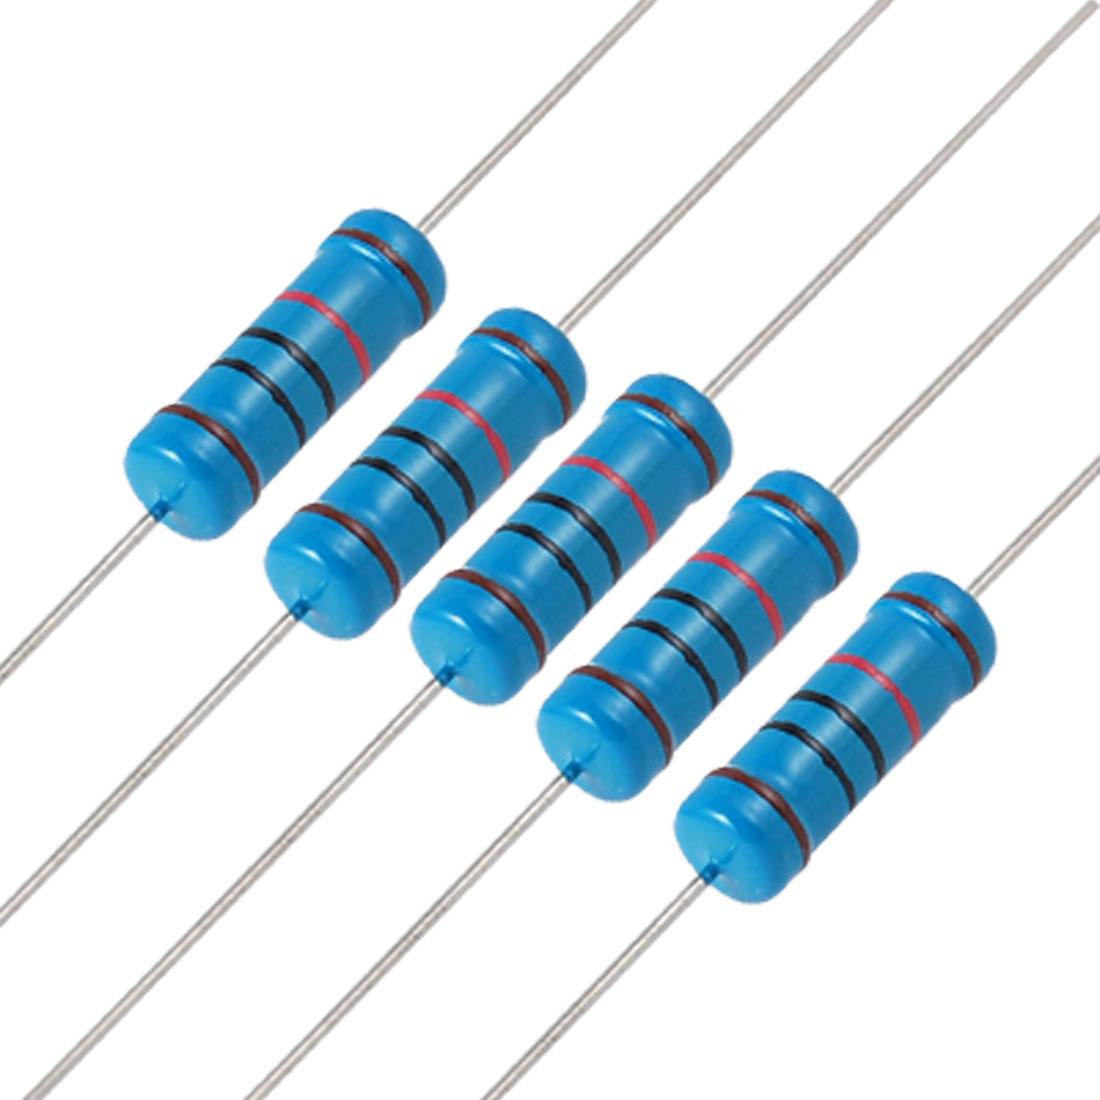 10K Ohm 3W 1% Axial Lead Metal Film Resistor 100 Pcs